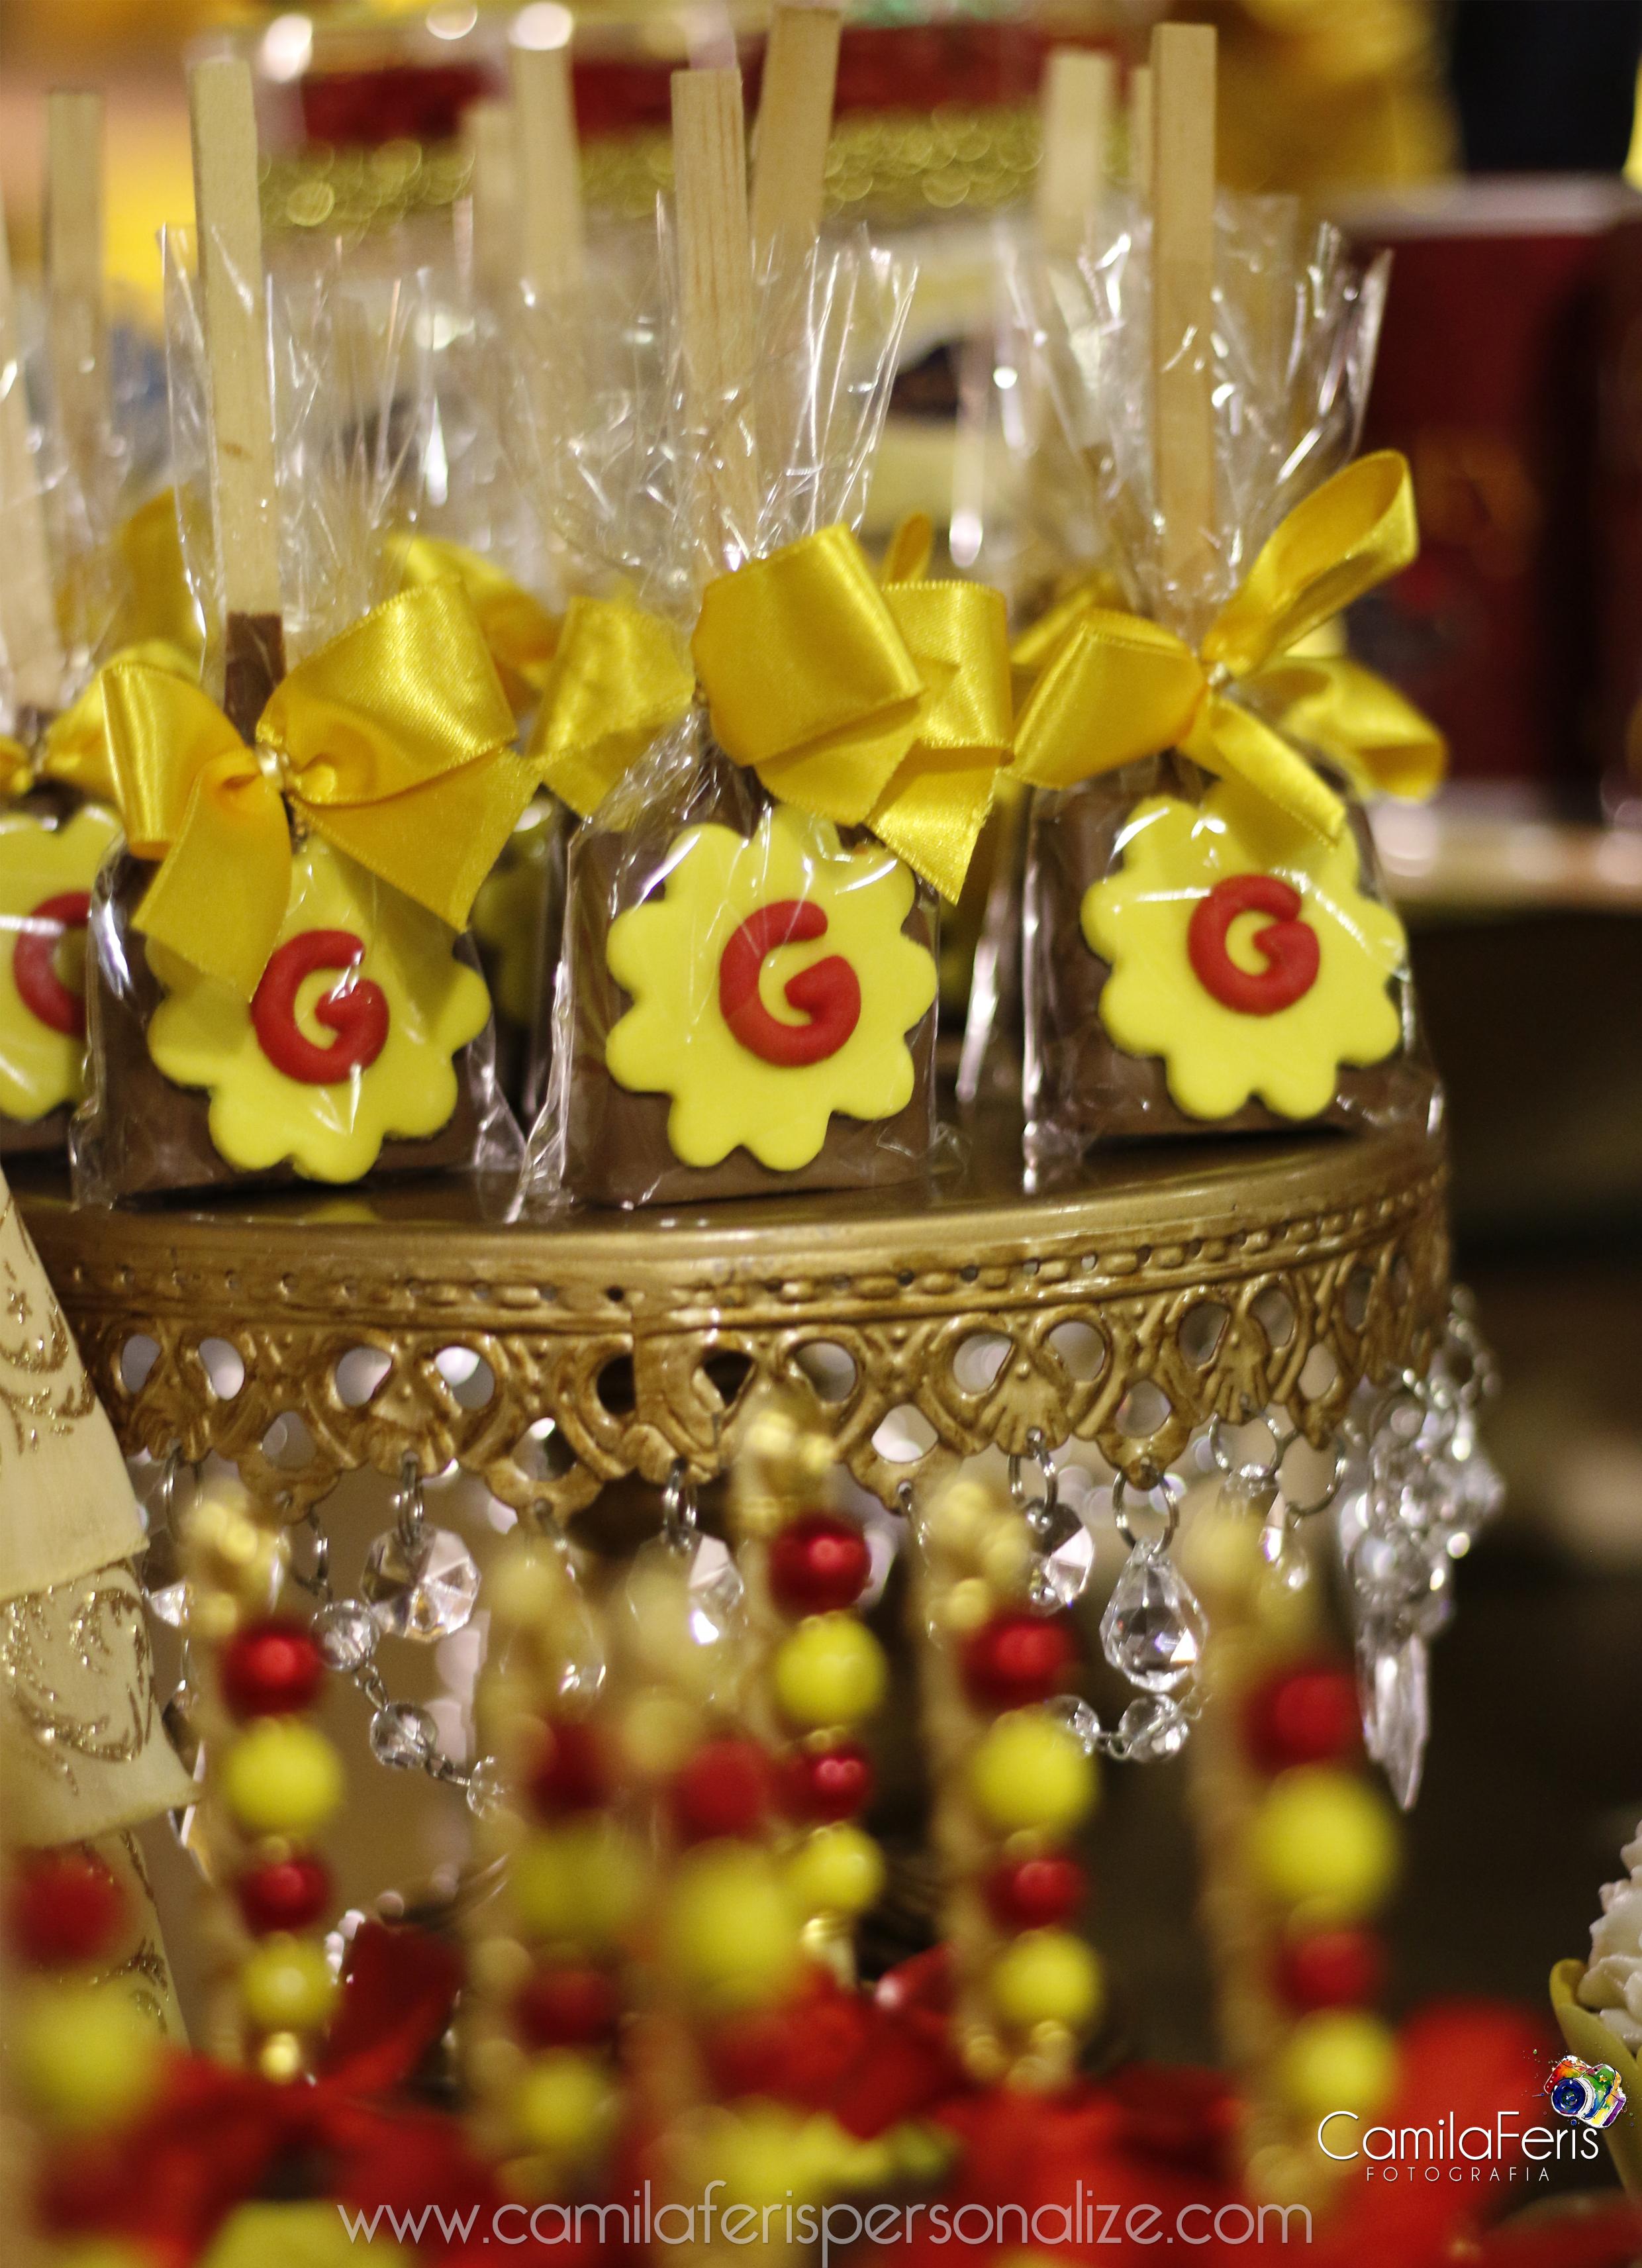 chocolate personalizado bela e a fera.jpg